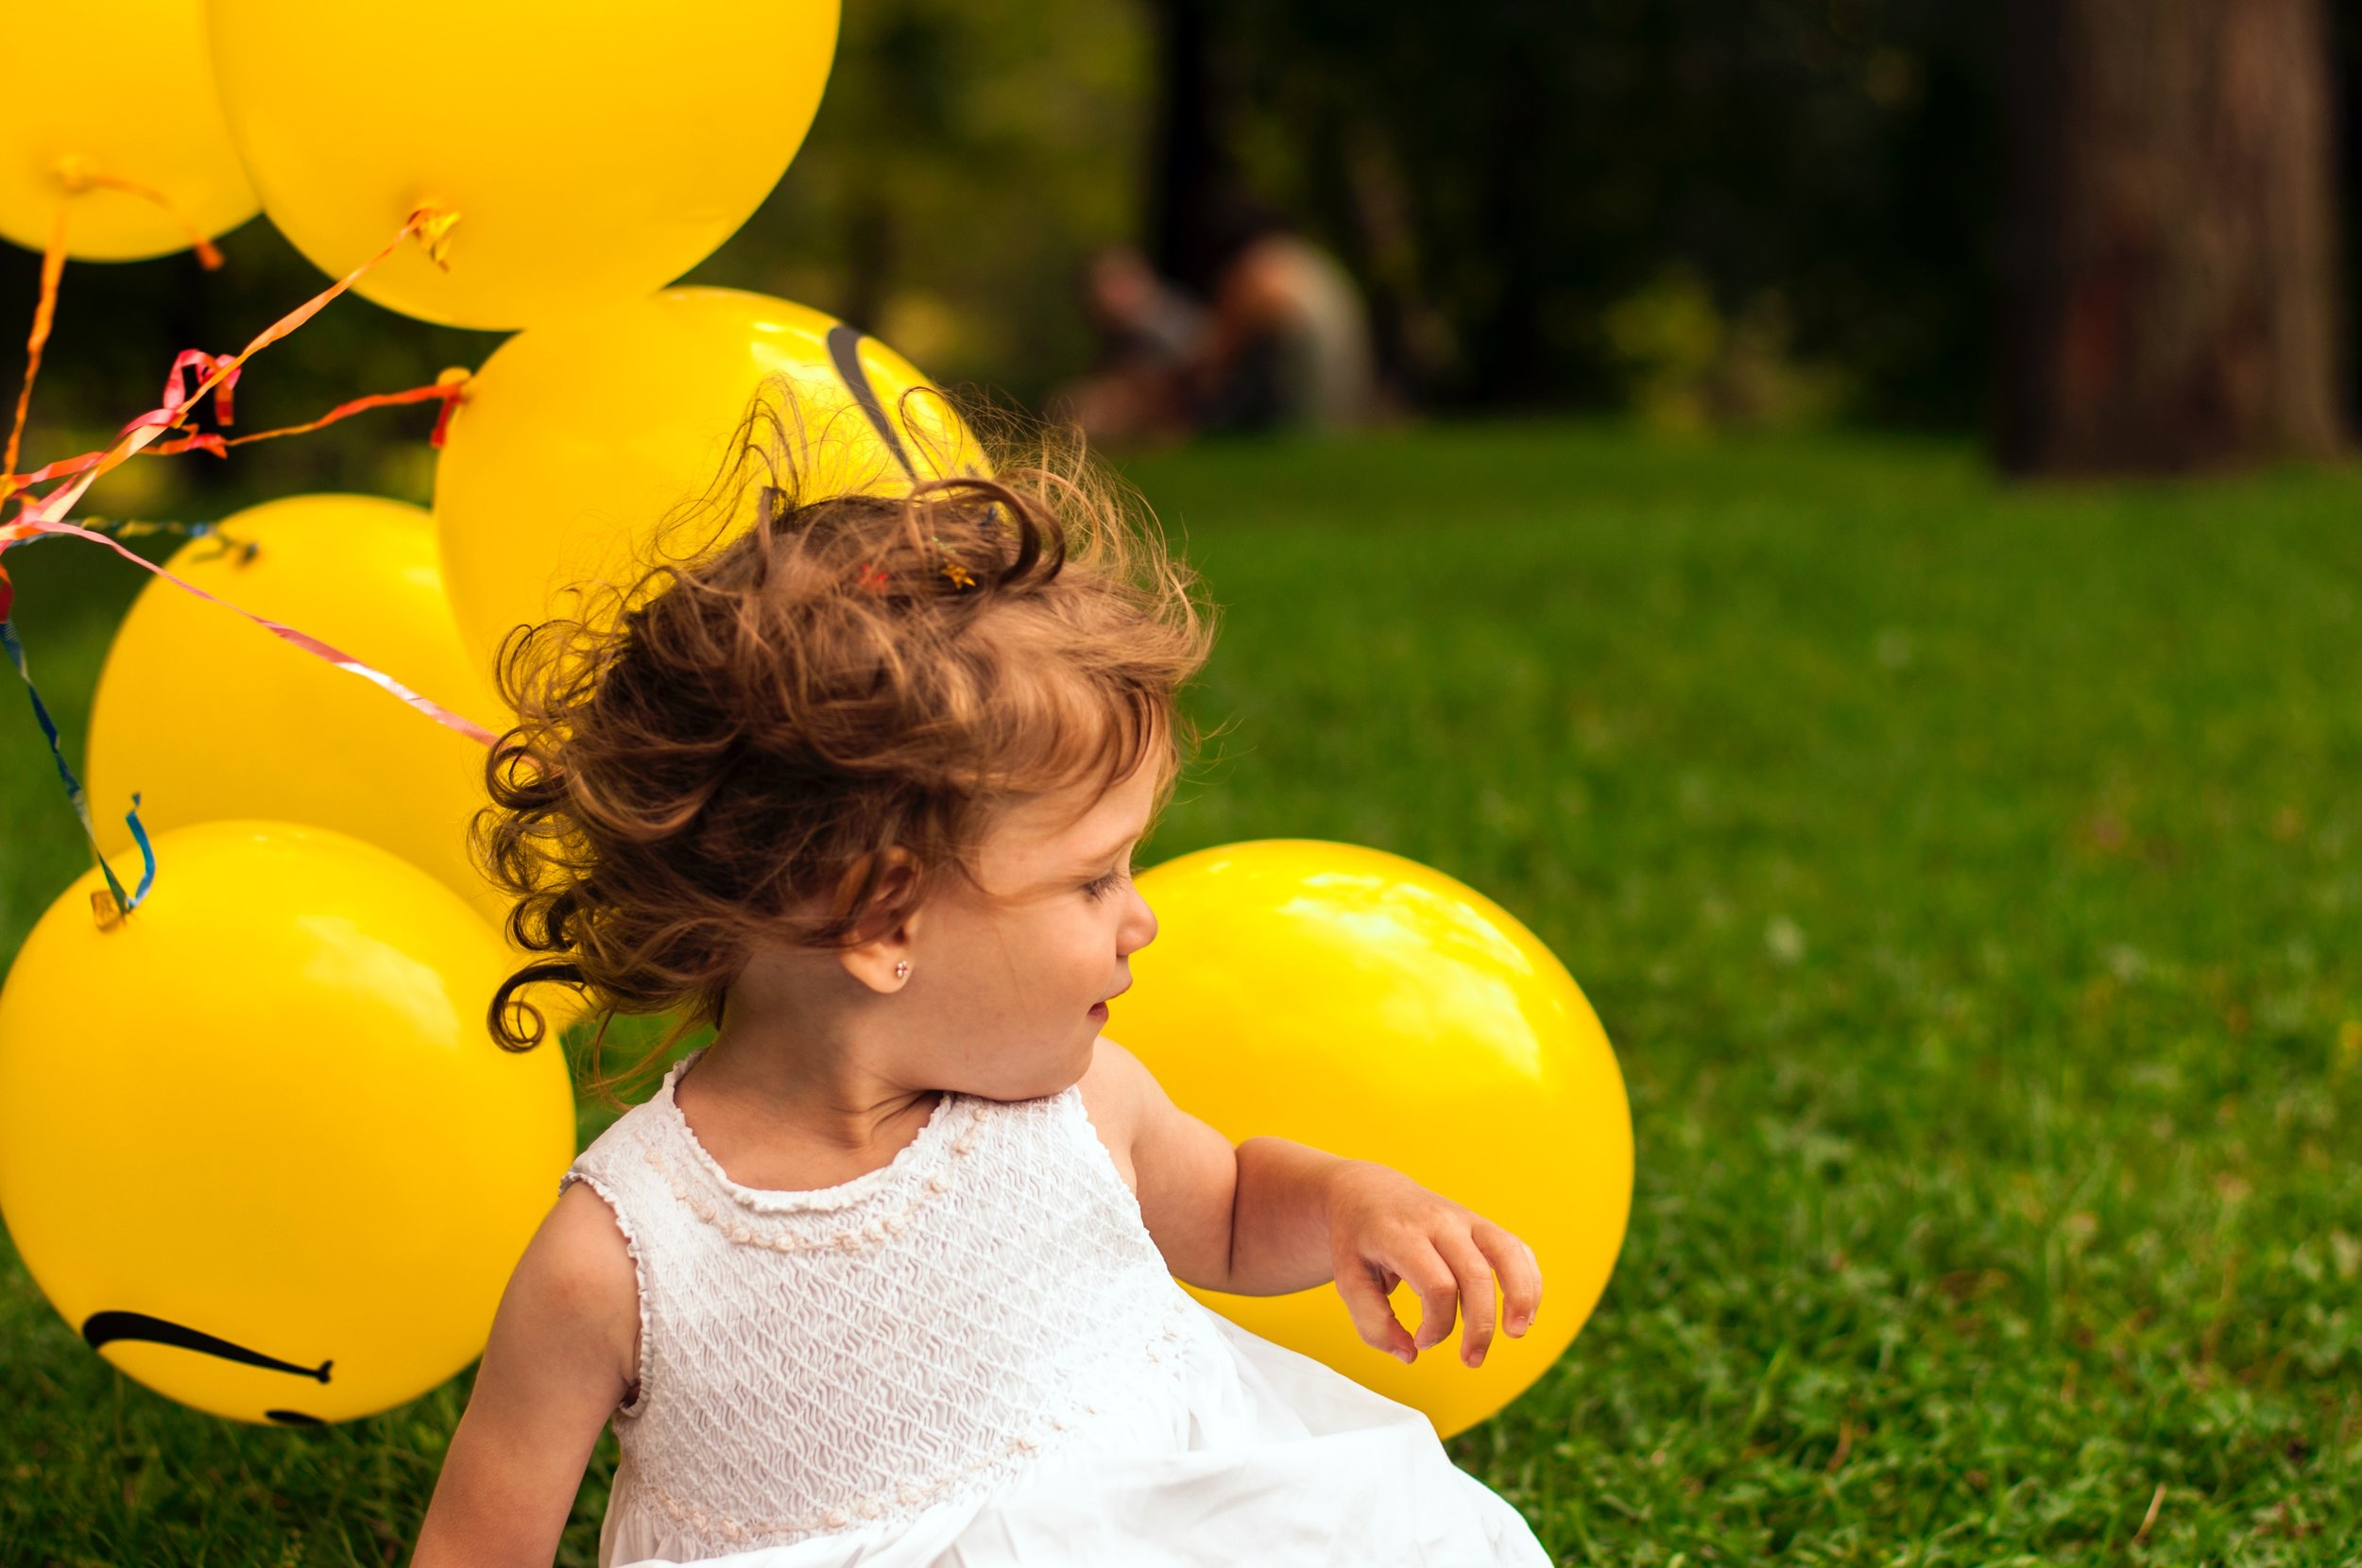 CHILDRENS PARTIES    EXPLORE